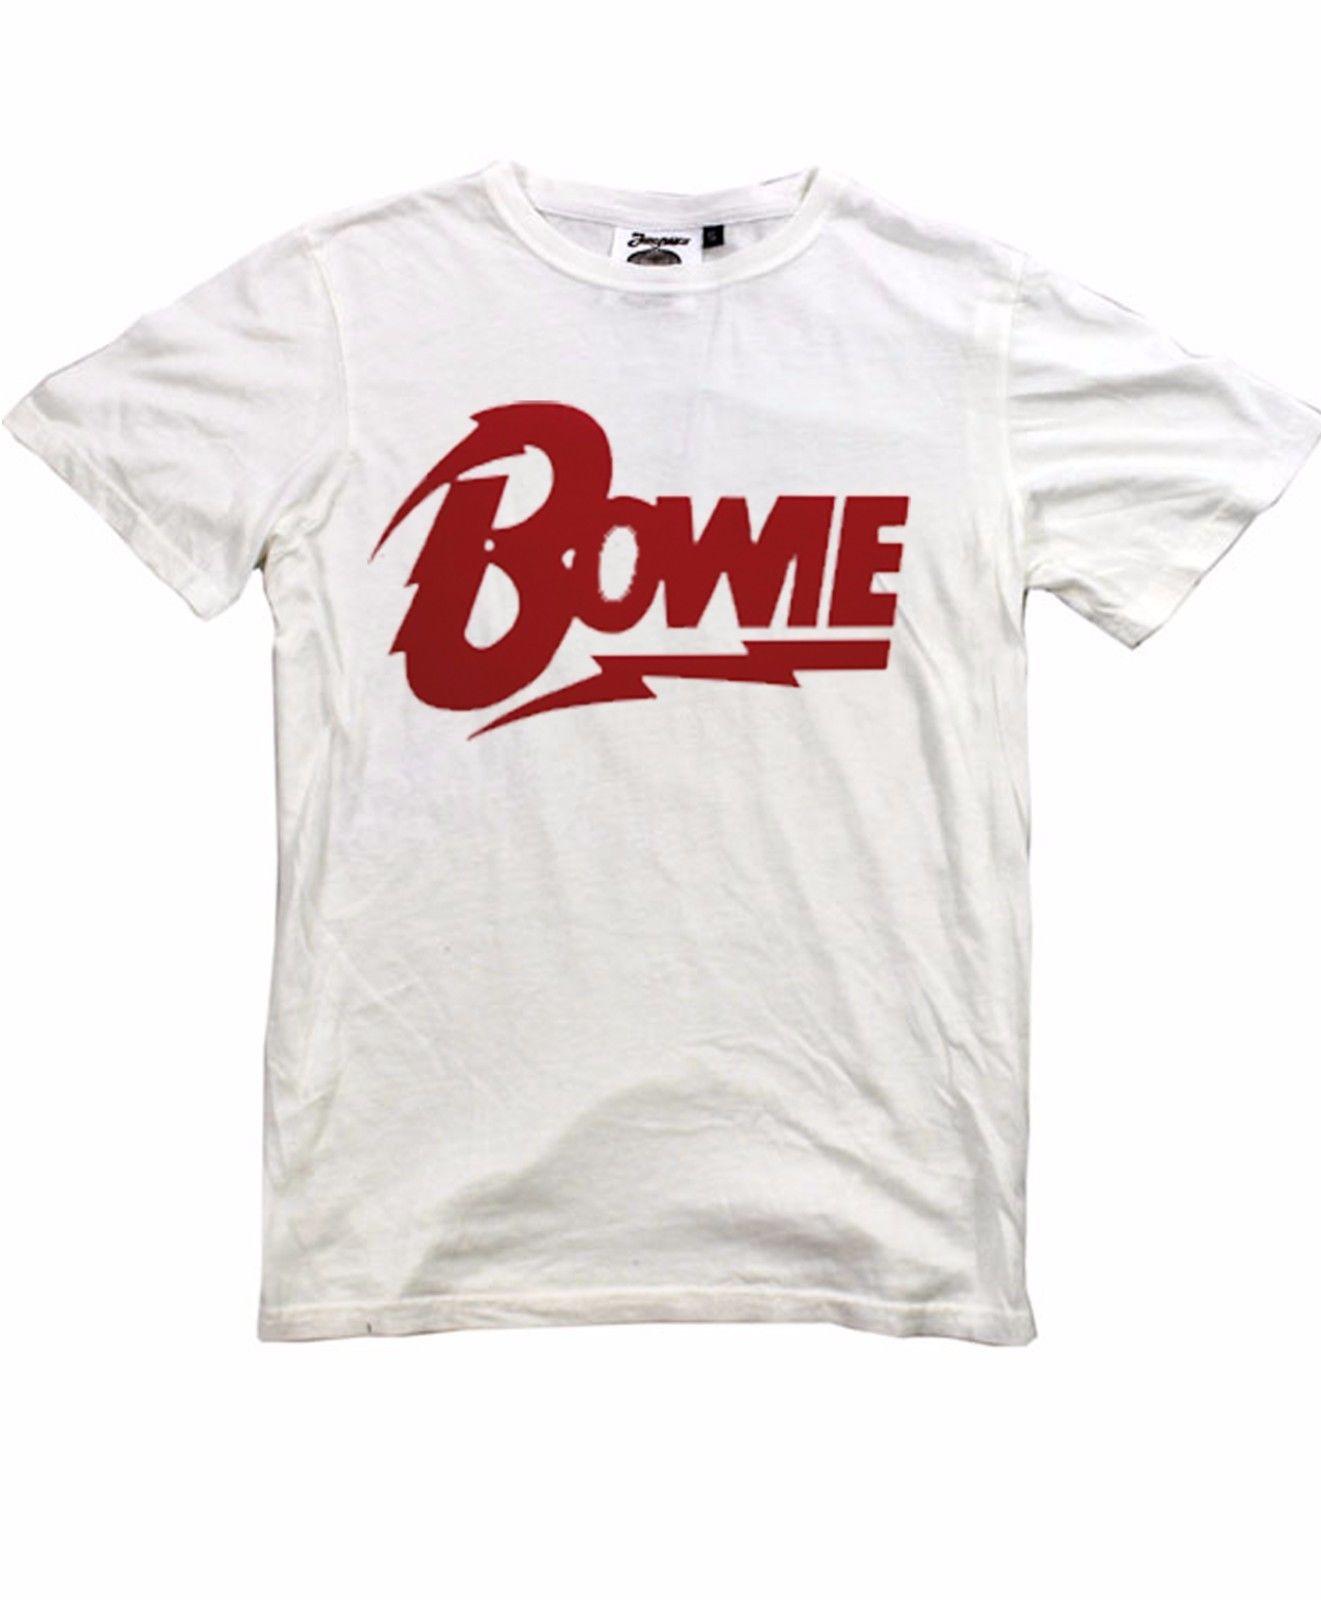 david bowie t shirt sizes s m l xl xxl new white t shirt vintage 80 39 s pop t shirt brand 2018. Black Bedroom Furniture Sets. Home Design Ideas